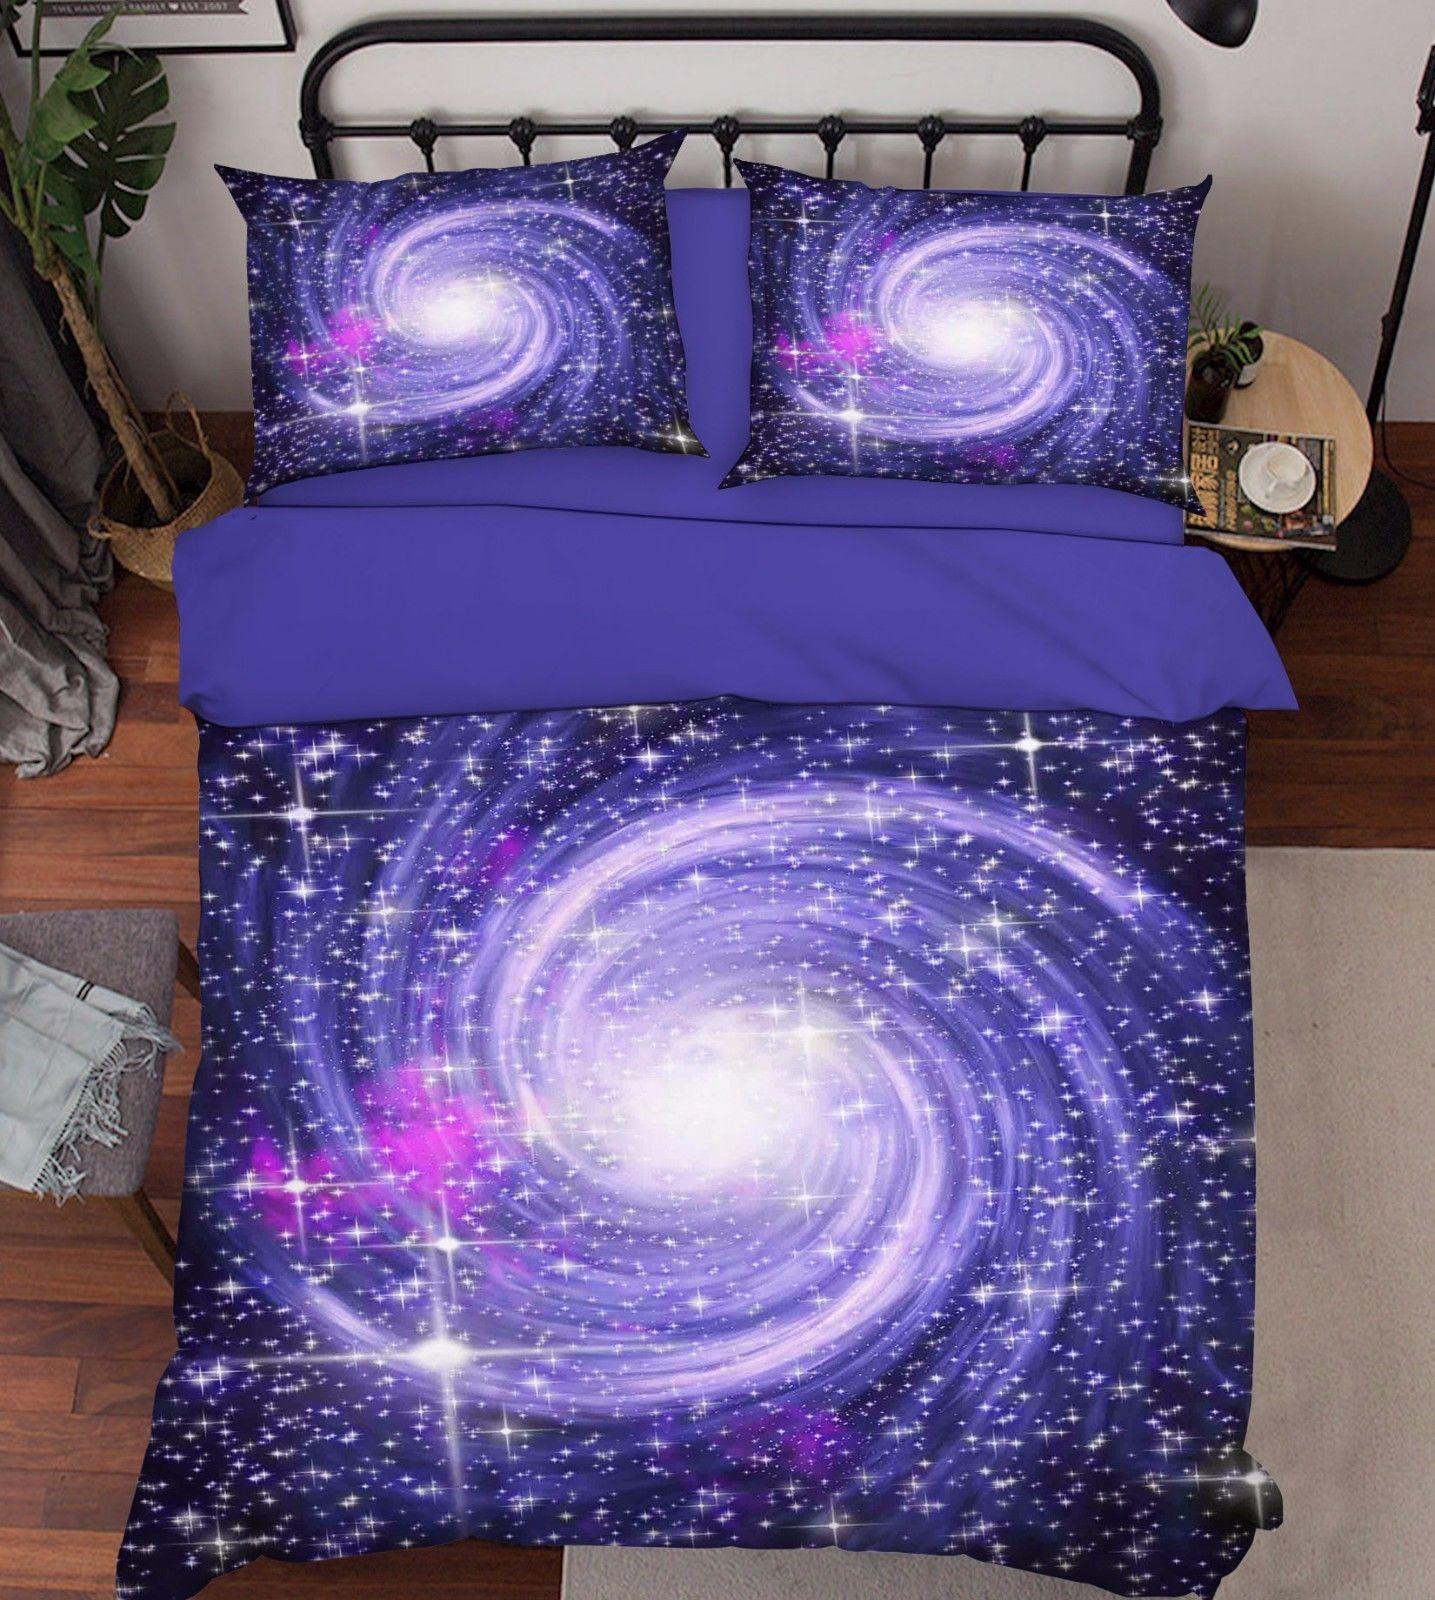 3D Nebula Sky 23 Bed Pillowcases Quilt Duvet Cover Set Single Queen King Size AU - $90.04 - $122.20